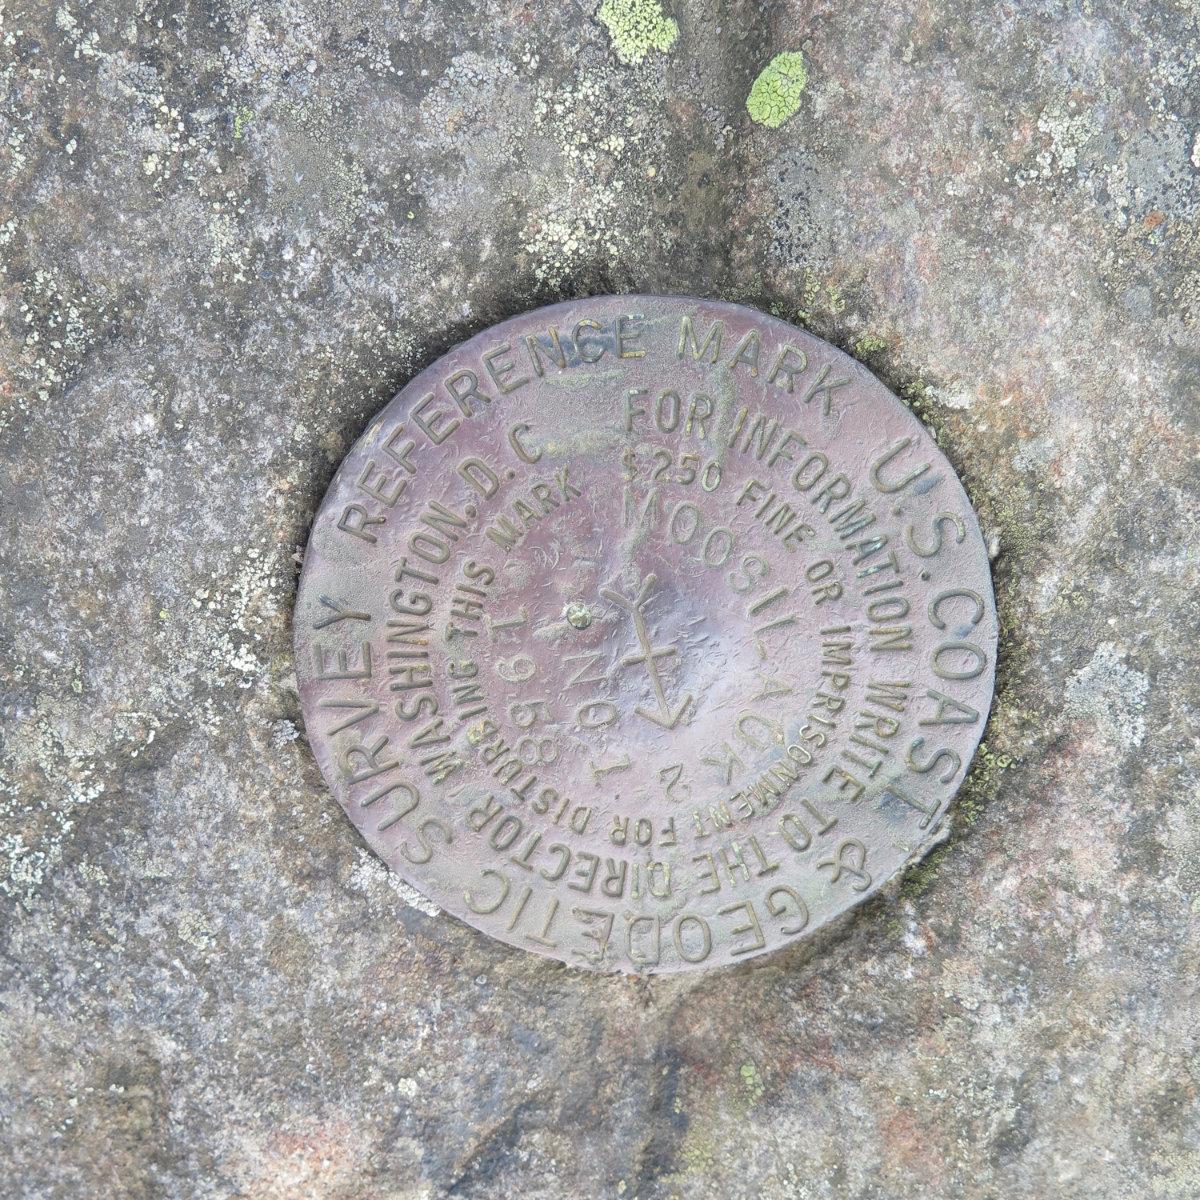 Moosilauke-Summit-Medallion-20190627